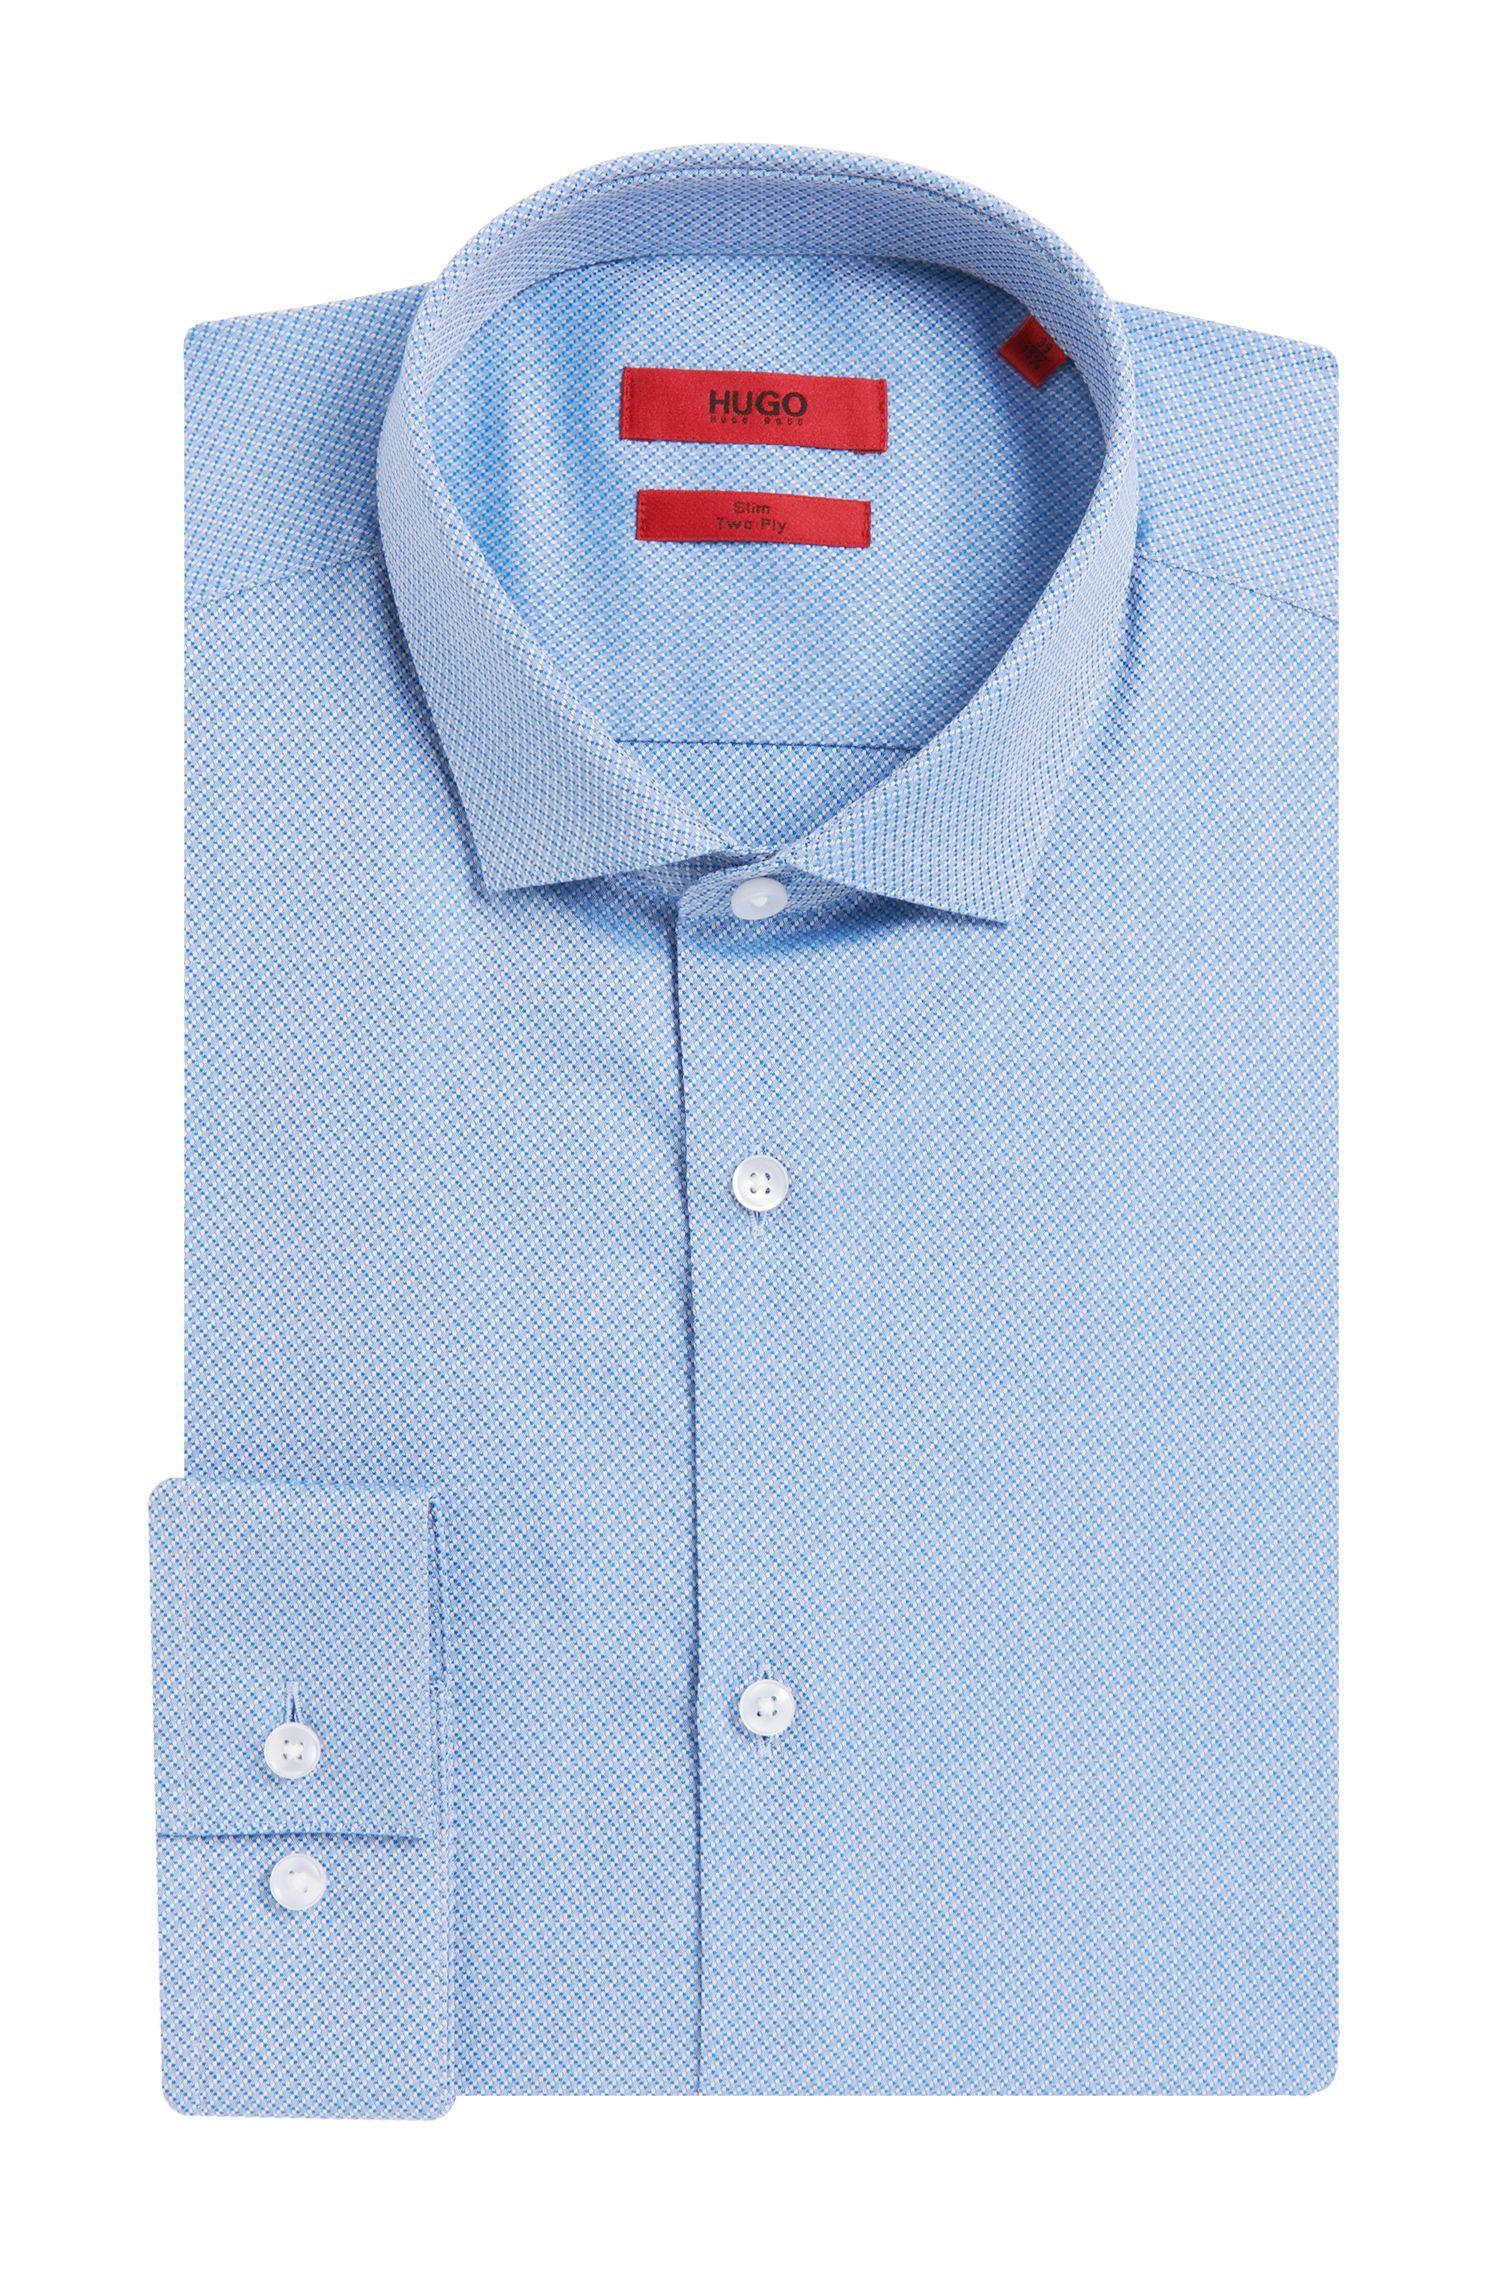 'Erondo'   Slim Fit, 2-Ply Cotton Dress Shirt